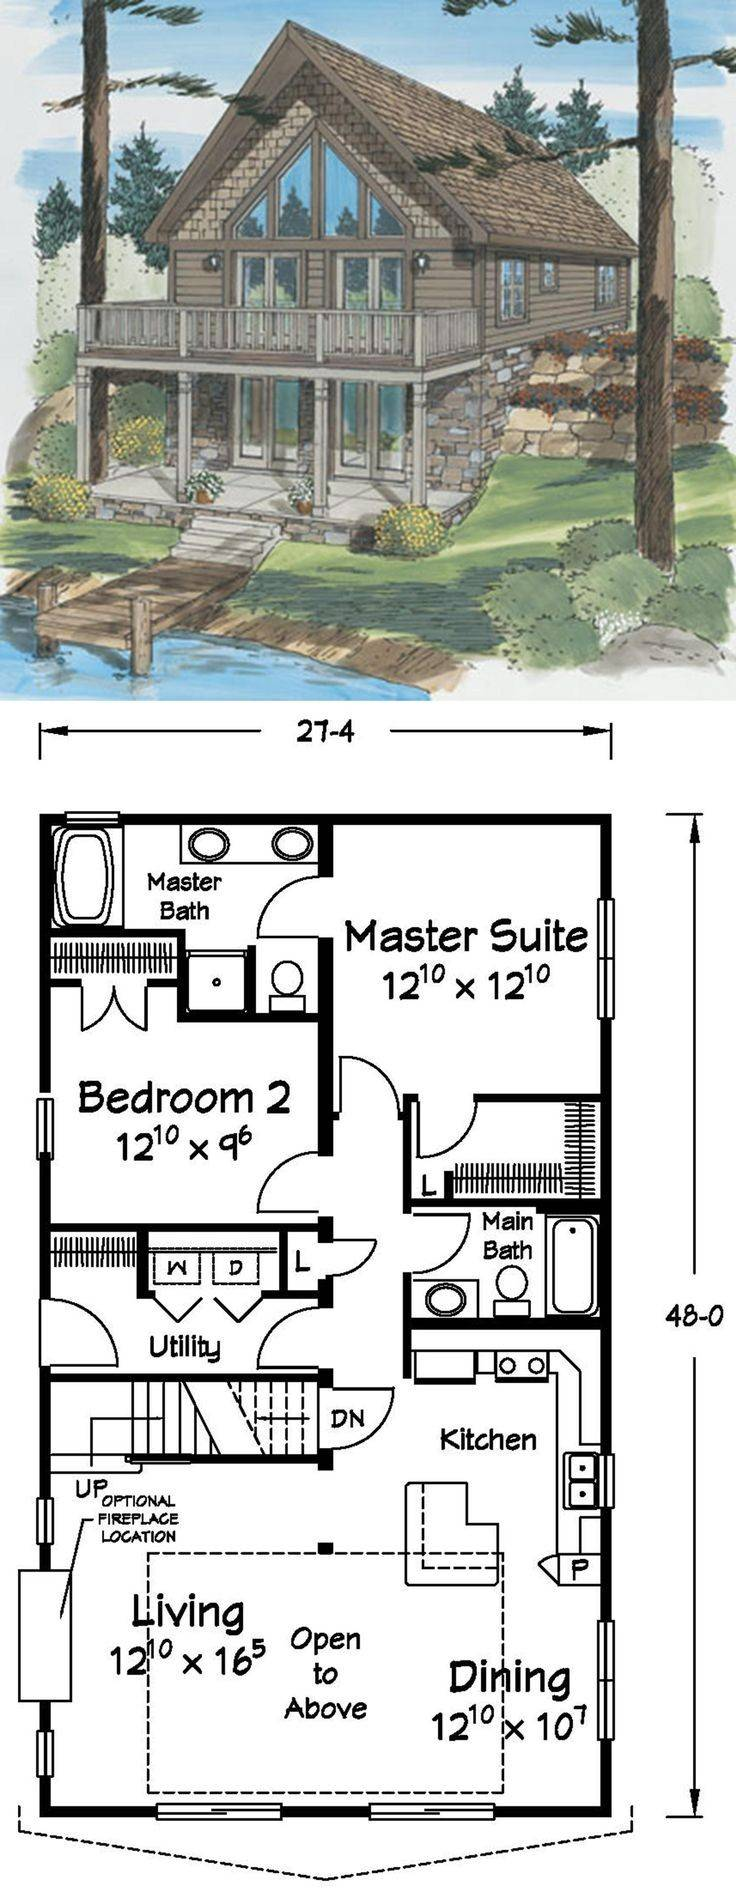 southern living lake house plans unique best house plans